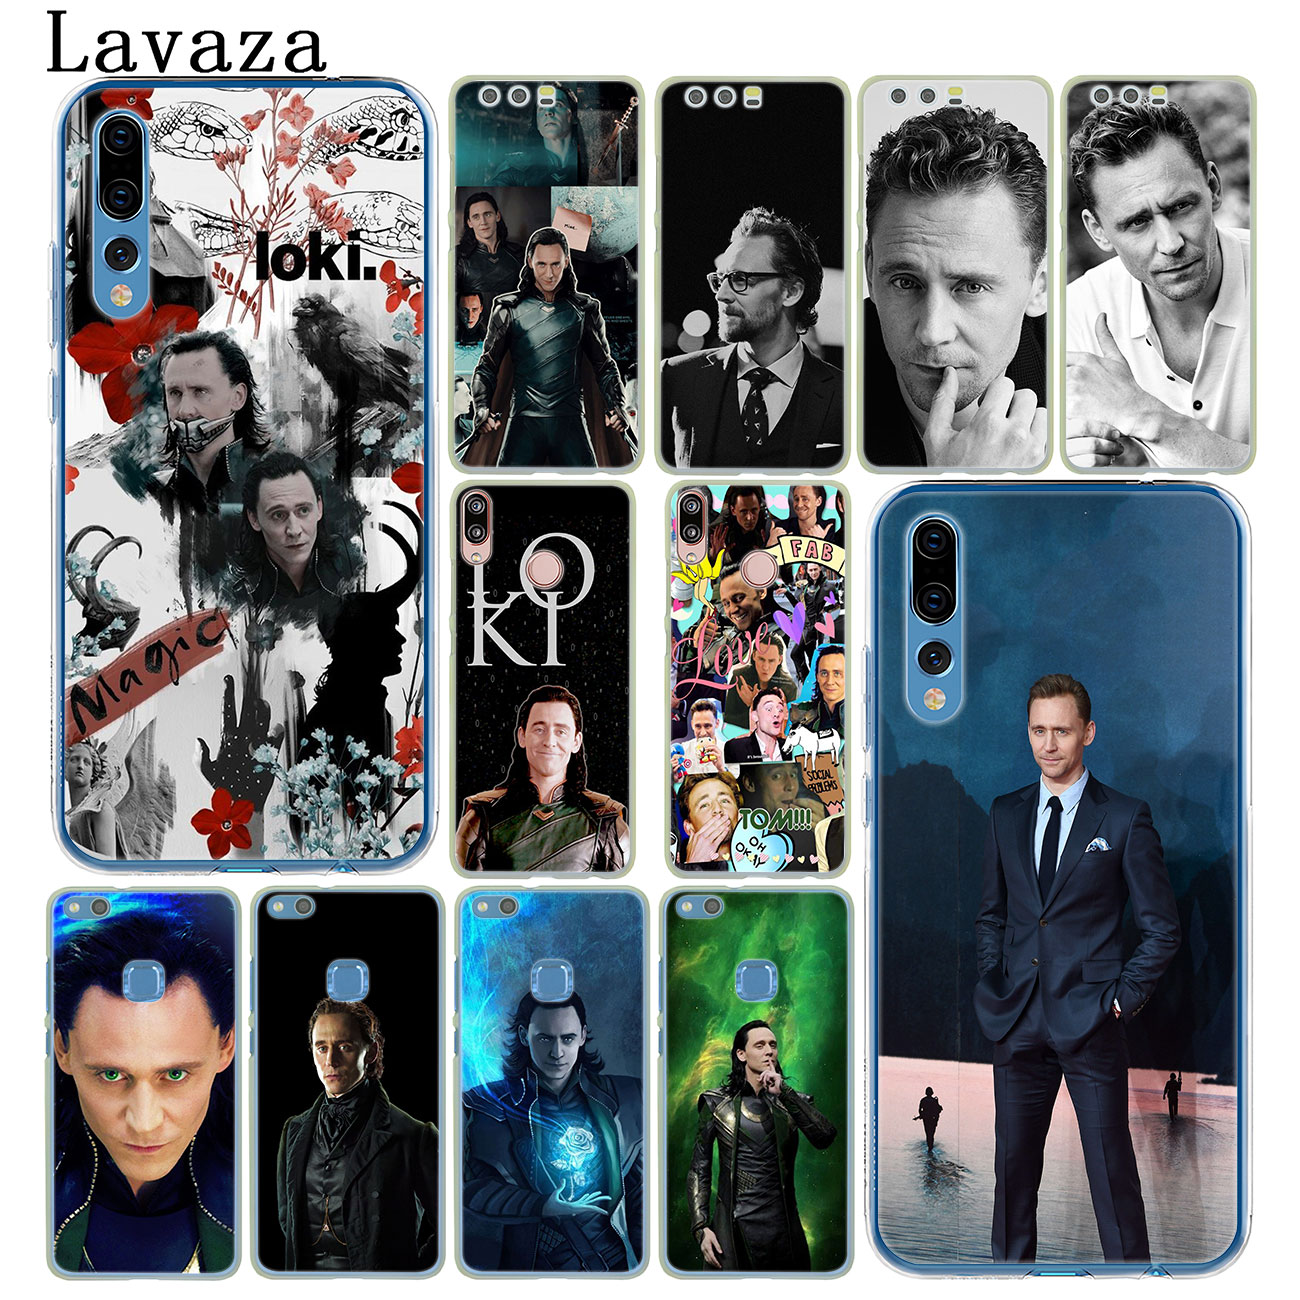 Lavaza Tom Hiddleston Loki funda del teléfono para Huawei Y9 Y7 primer 2018 2019 Honor 20 10 8 8A 8X9X9 Lite 7C 7X 7A Pro